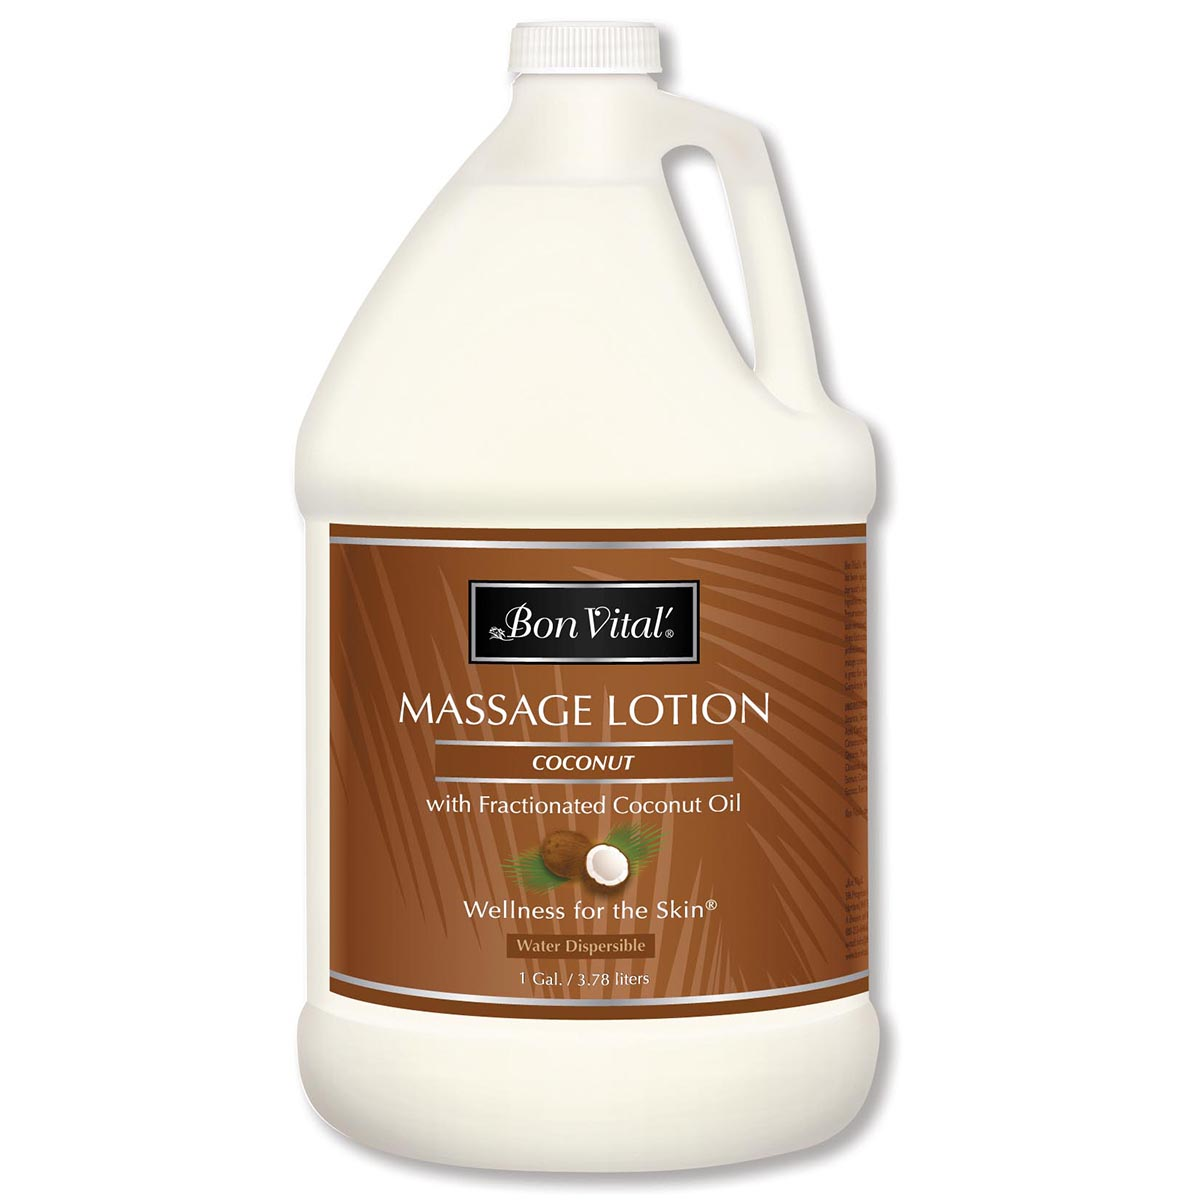 Bon Vital Coconut Massage Lotion  Massage Lotions